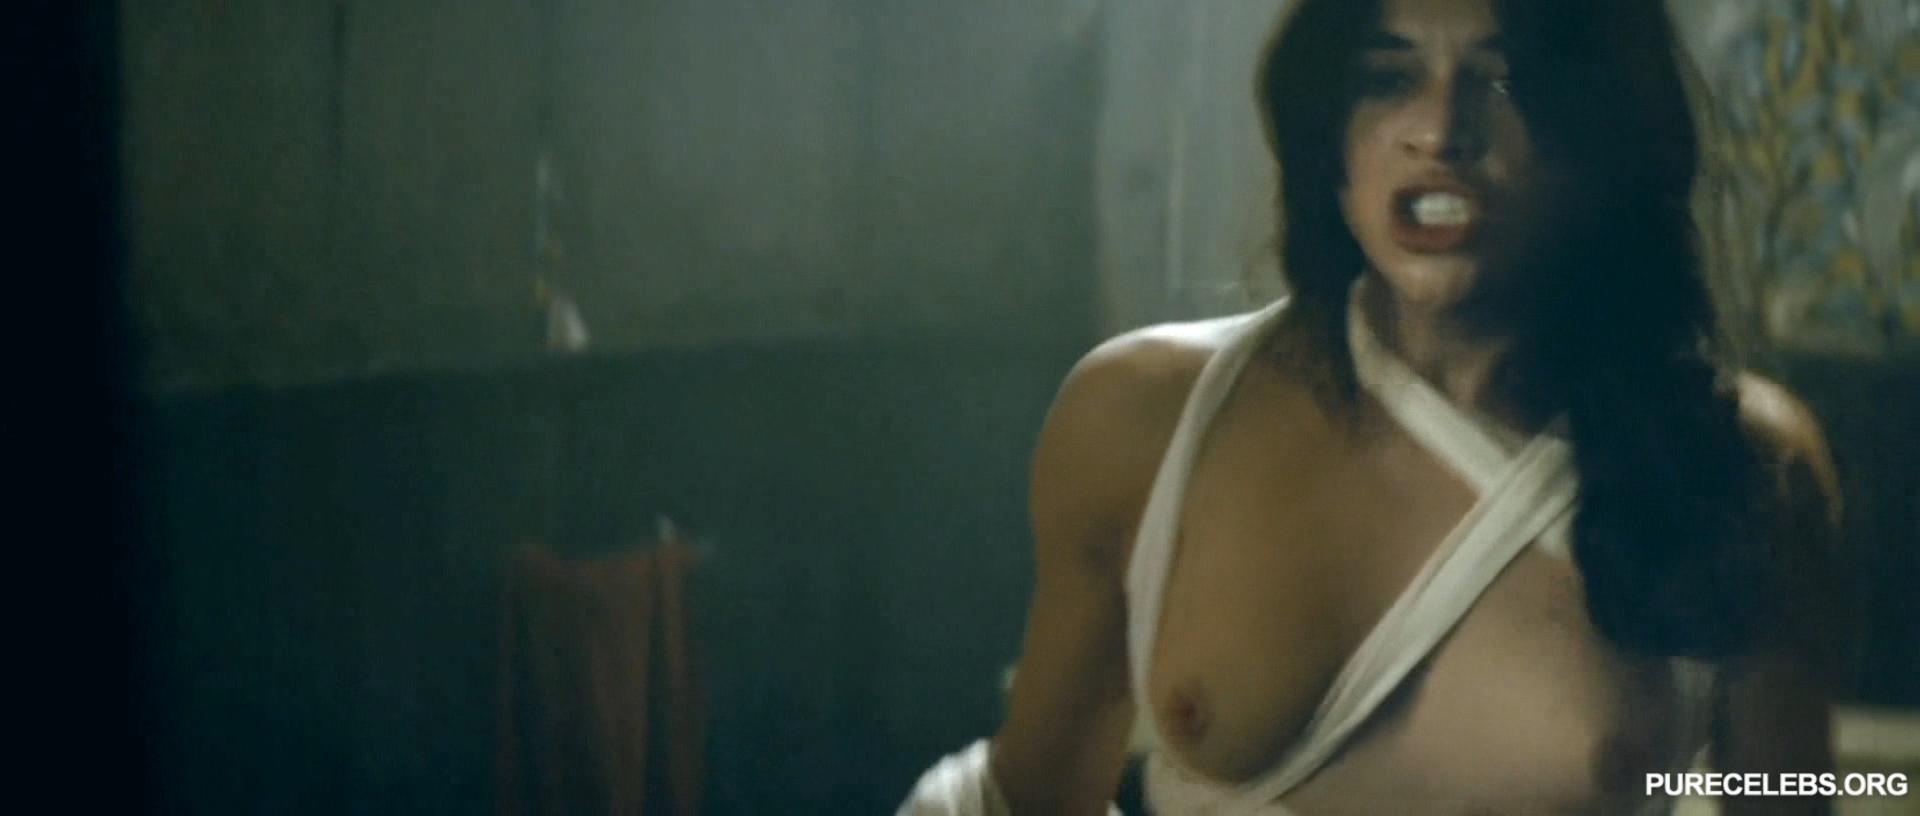 Belen Rodrigueza Sex Tape